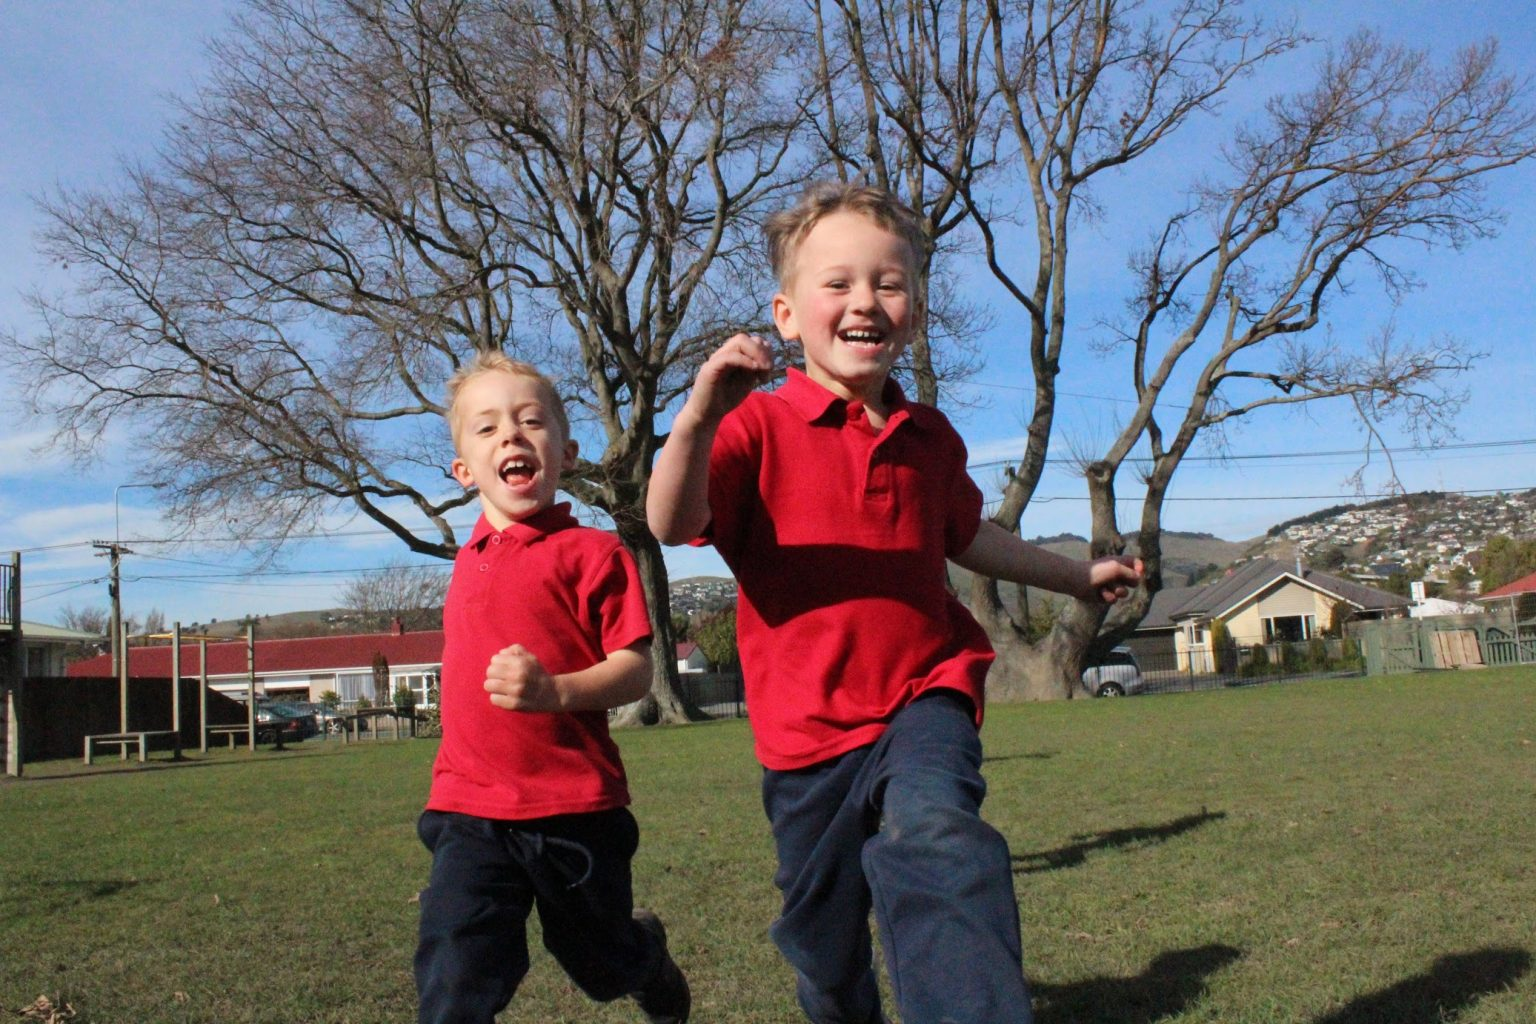 Two Somerfield Te Kura Wairepo male students running on school field